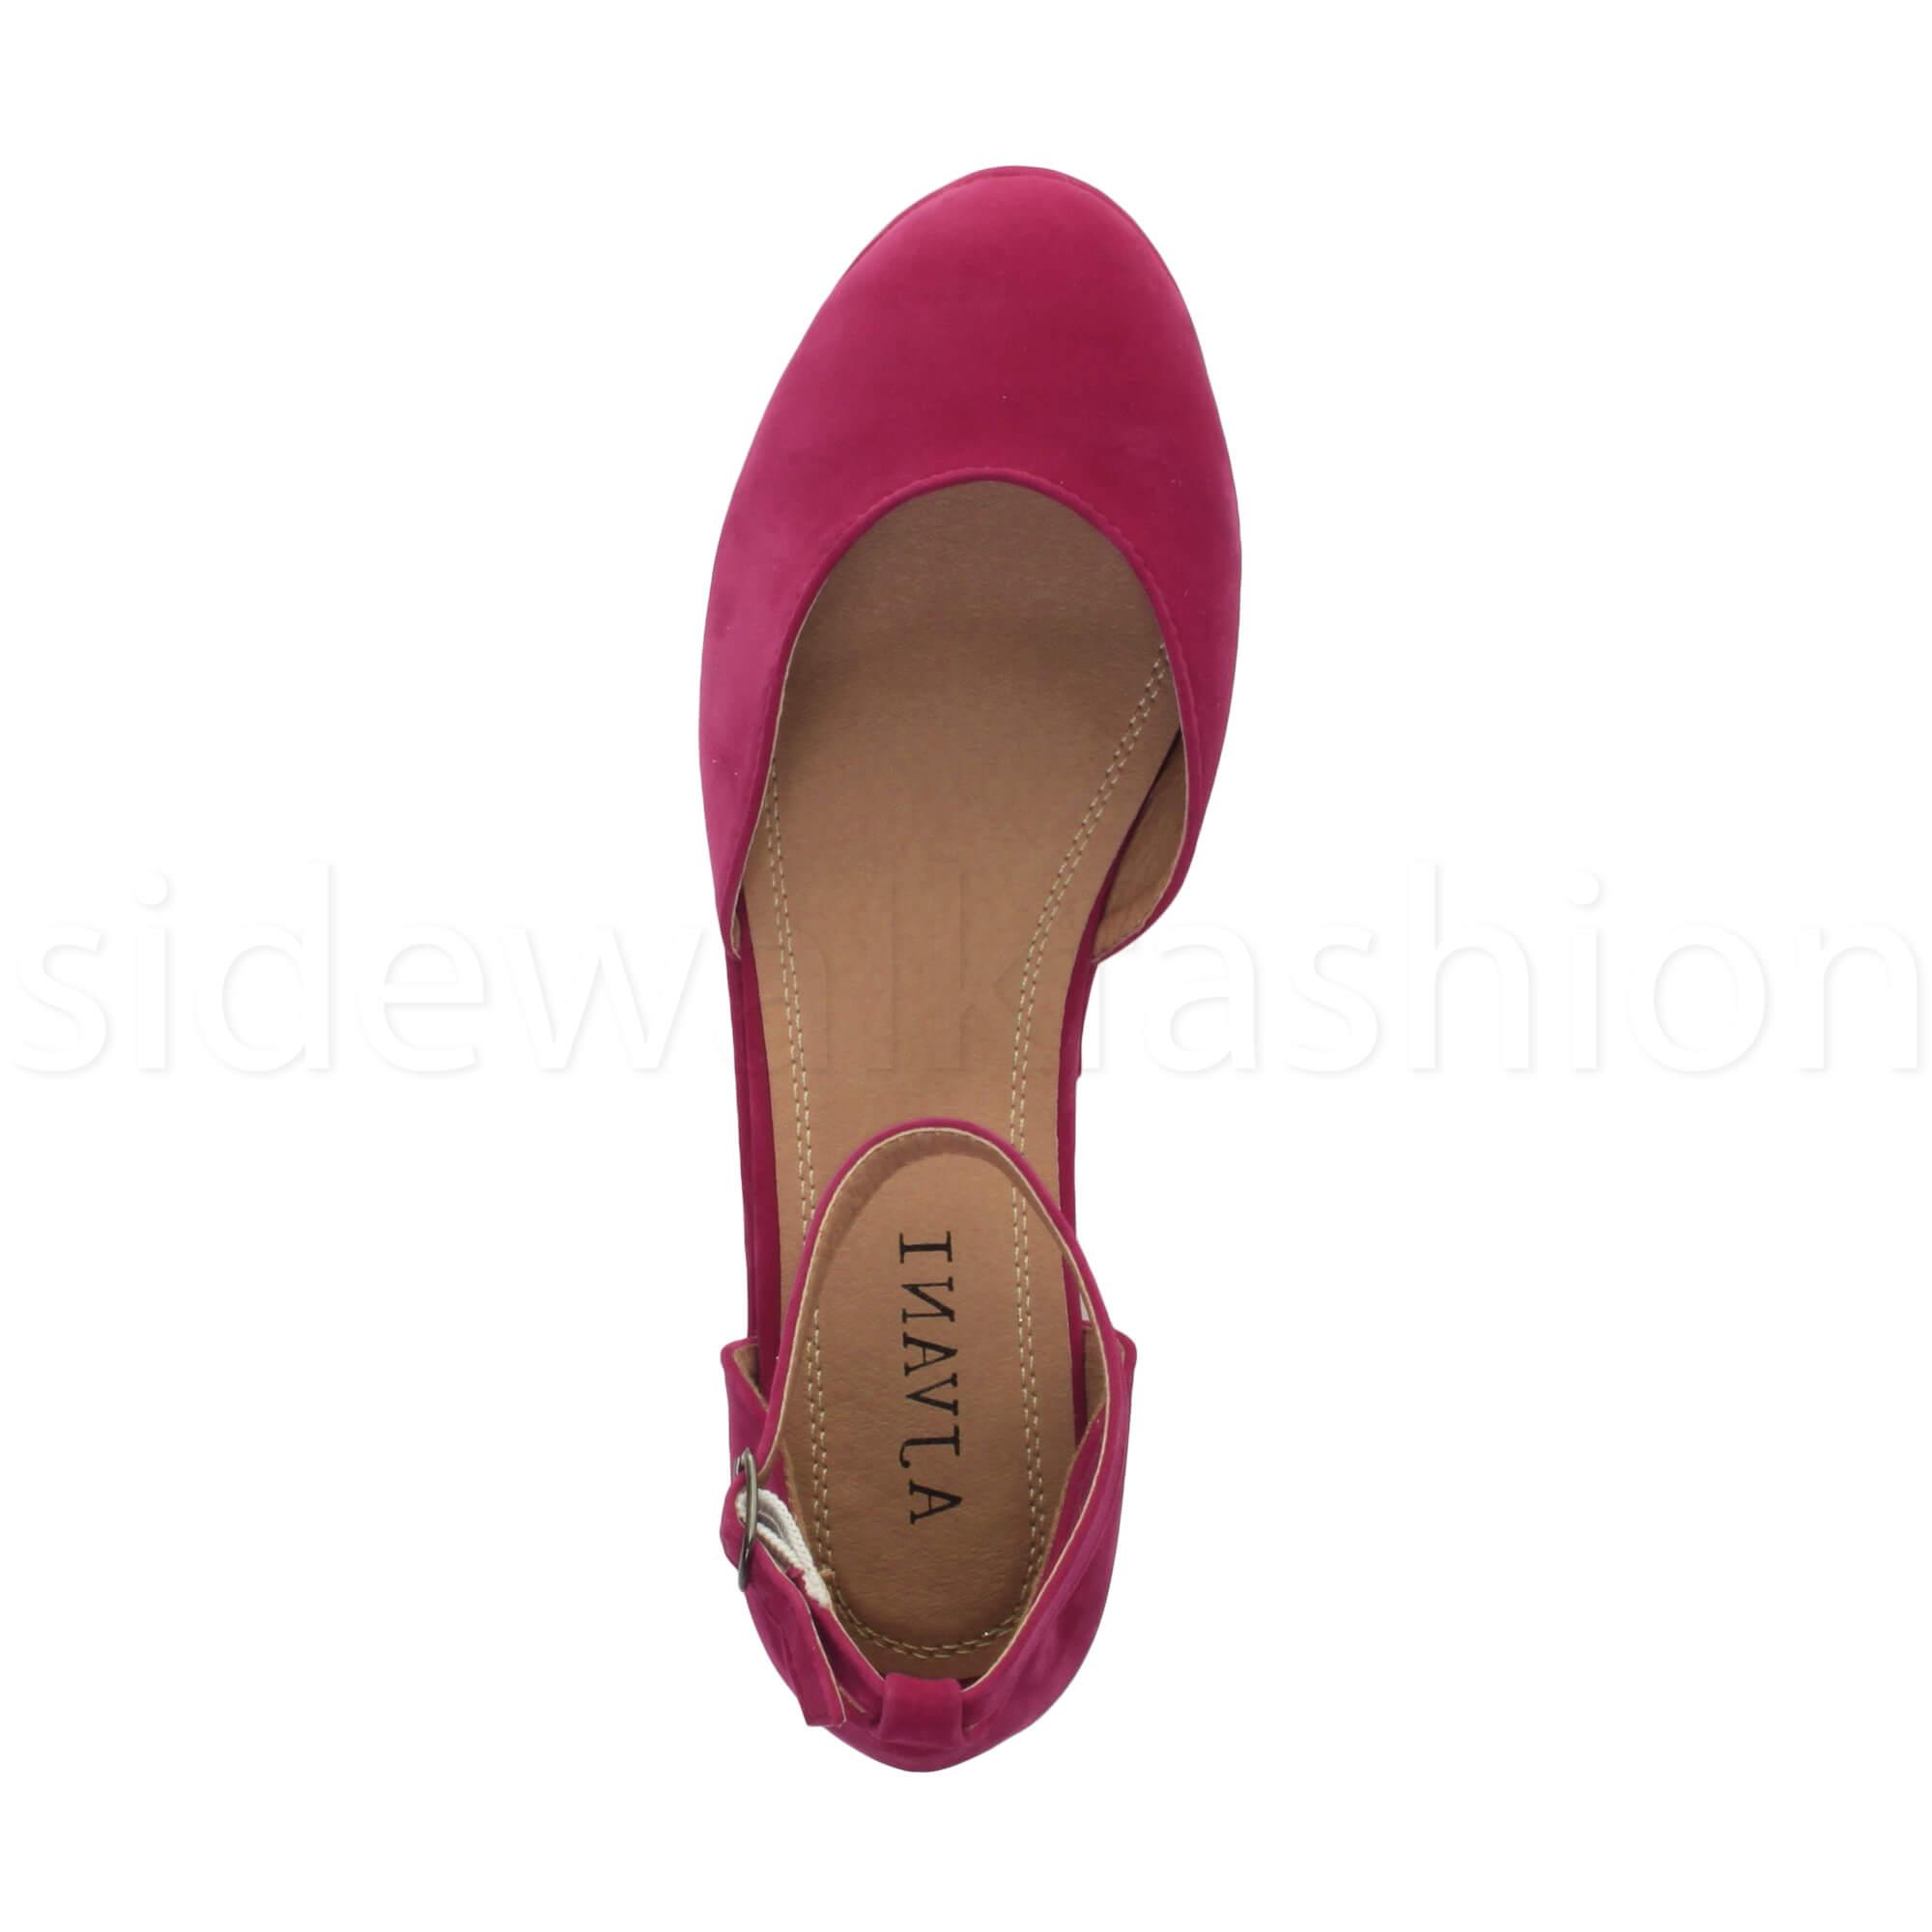 Womens-ladies-flatform-mid-wedge-ankle-strap-platform-court-shoes-sandals-size thumbnail 32